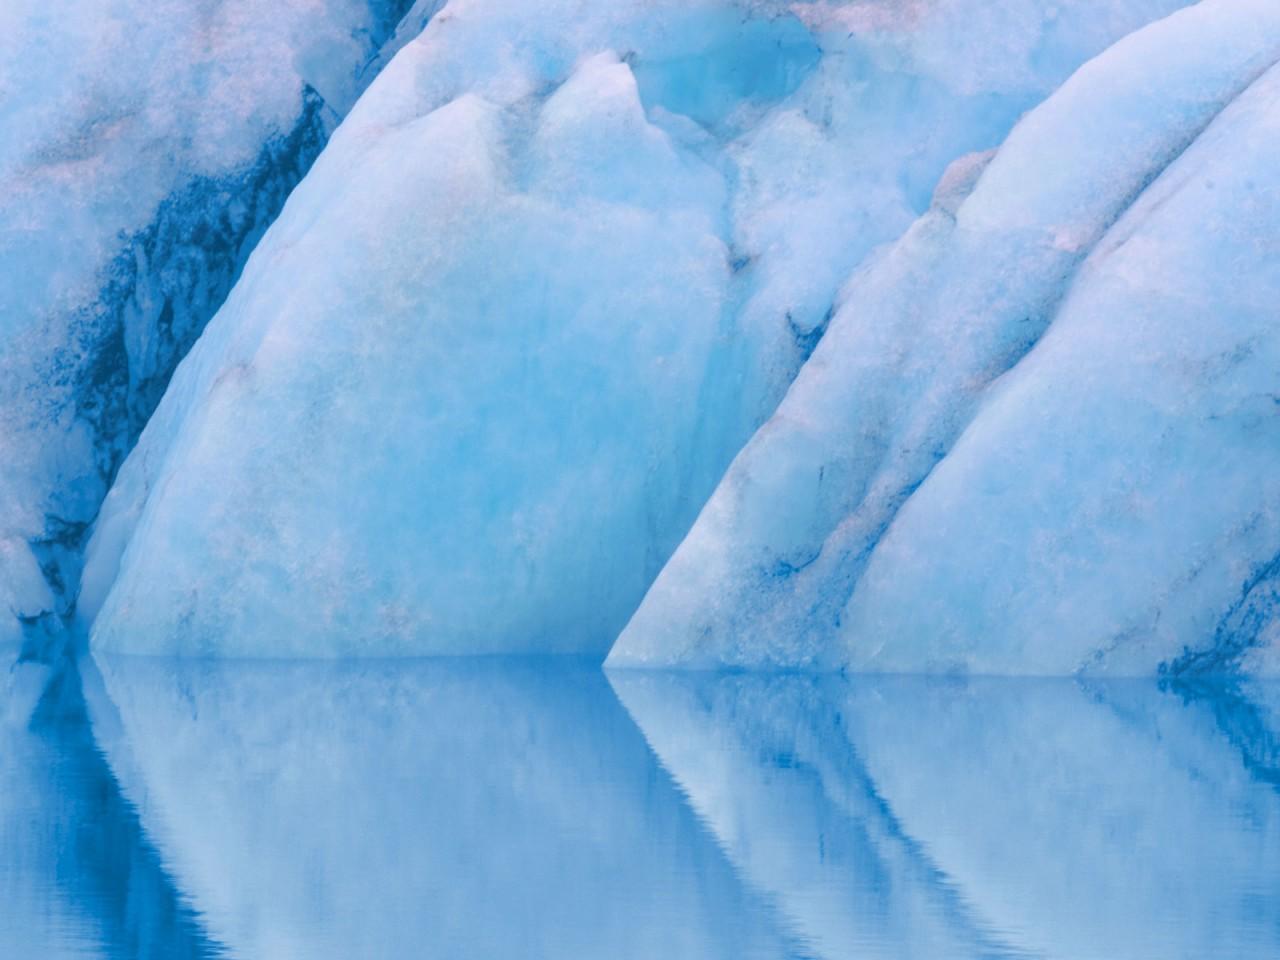 Seasonal Wallpaper For Iphone Crisp Ice Hd Wallpapers